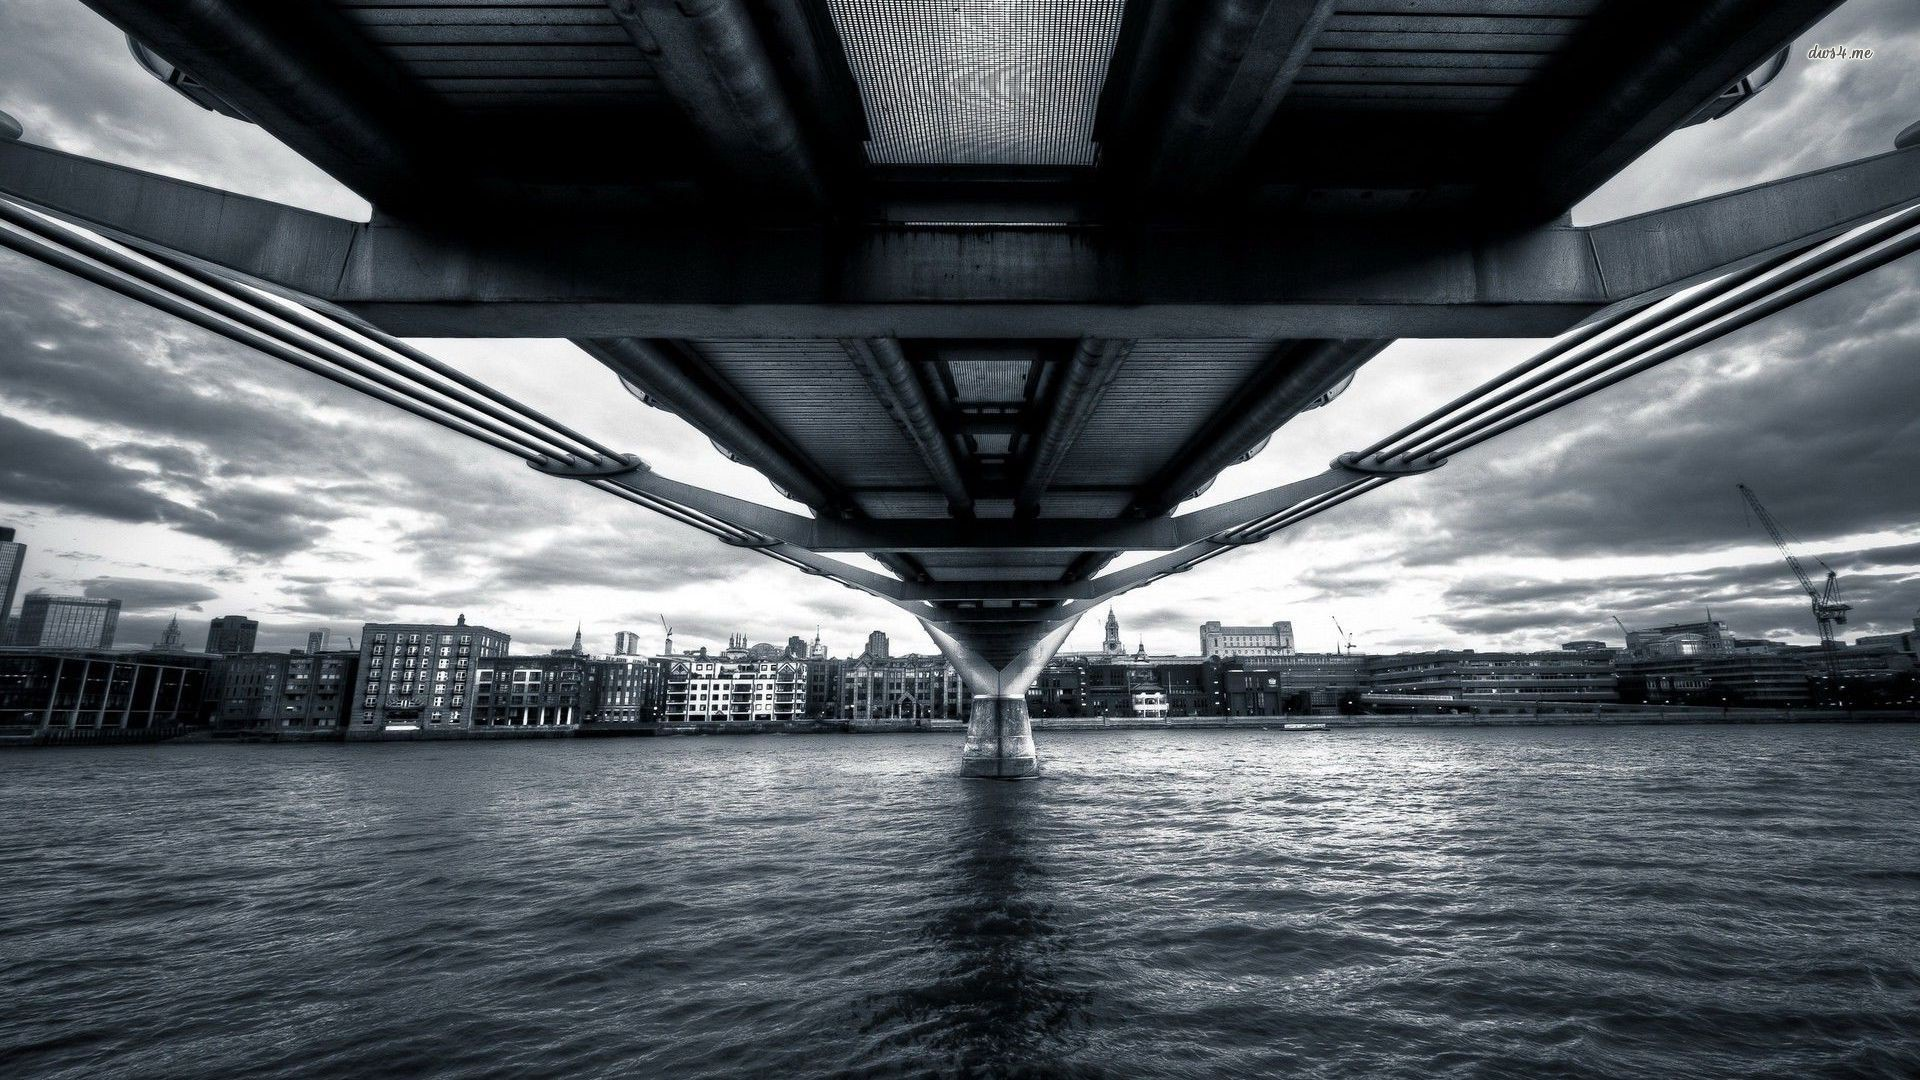 General 1920x1080 Millennium Bridge bridge London